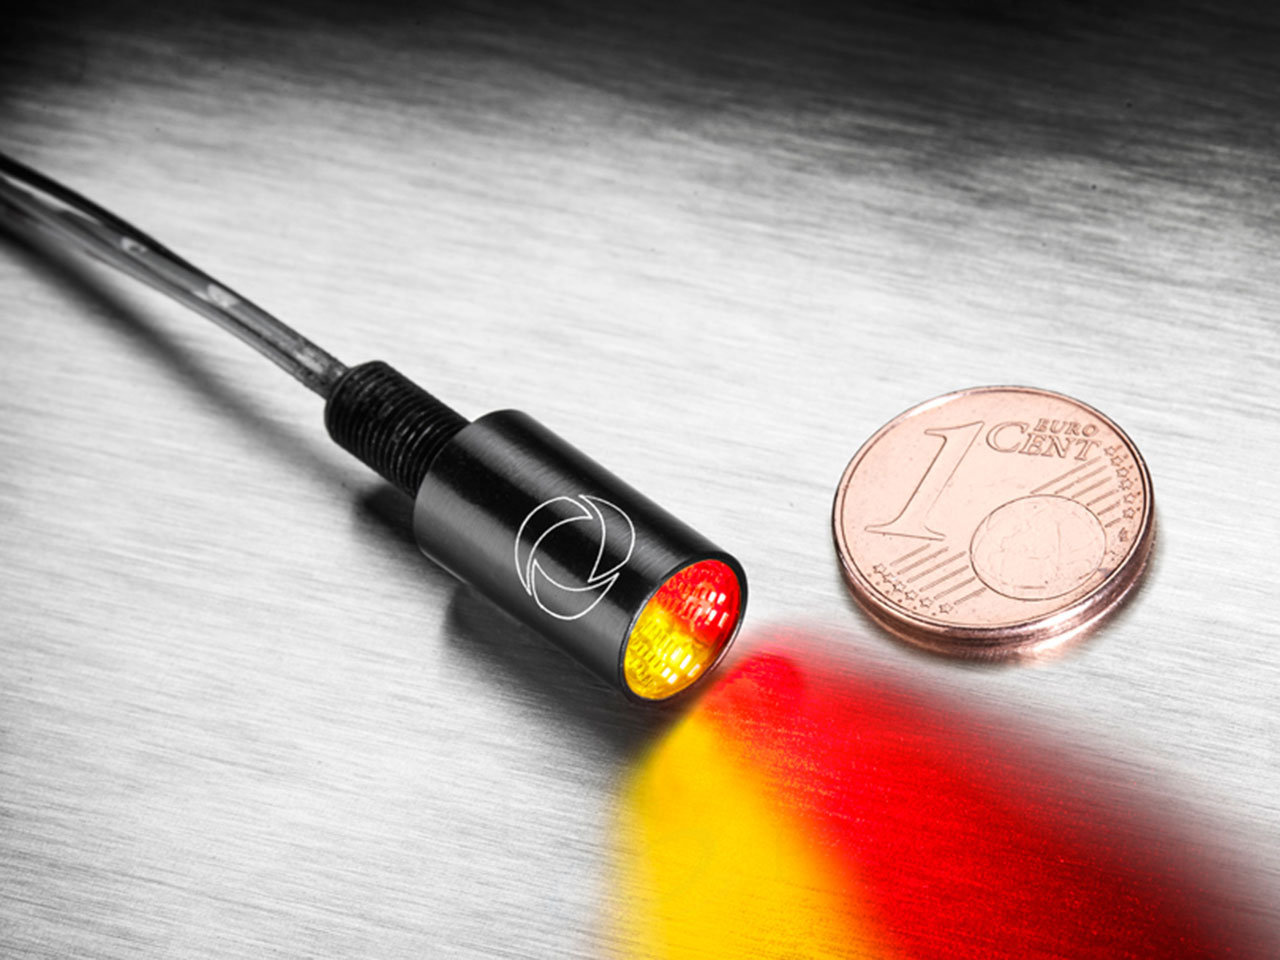 Kellermann / ケラーマン Atto DF Integral / アトー DF インテグラル 尾灯・制動灯機能付き ウインカー